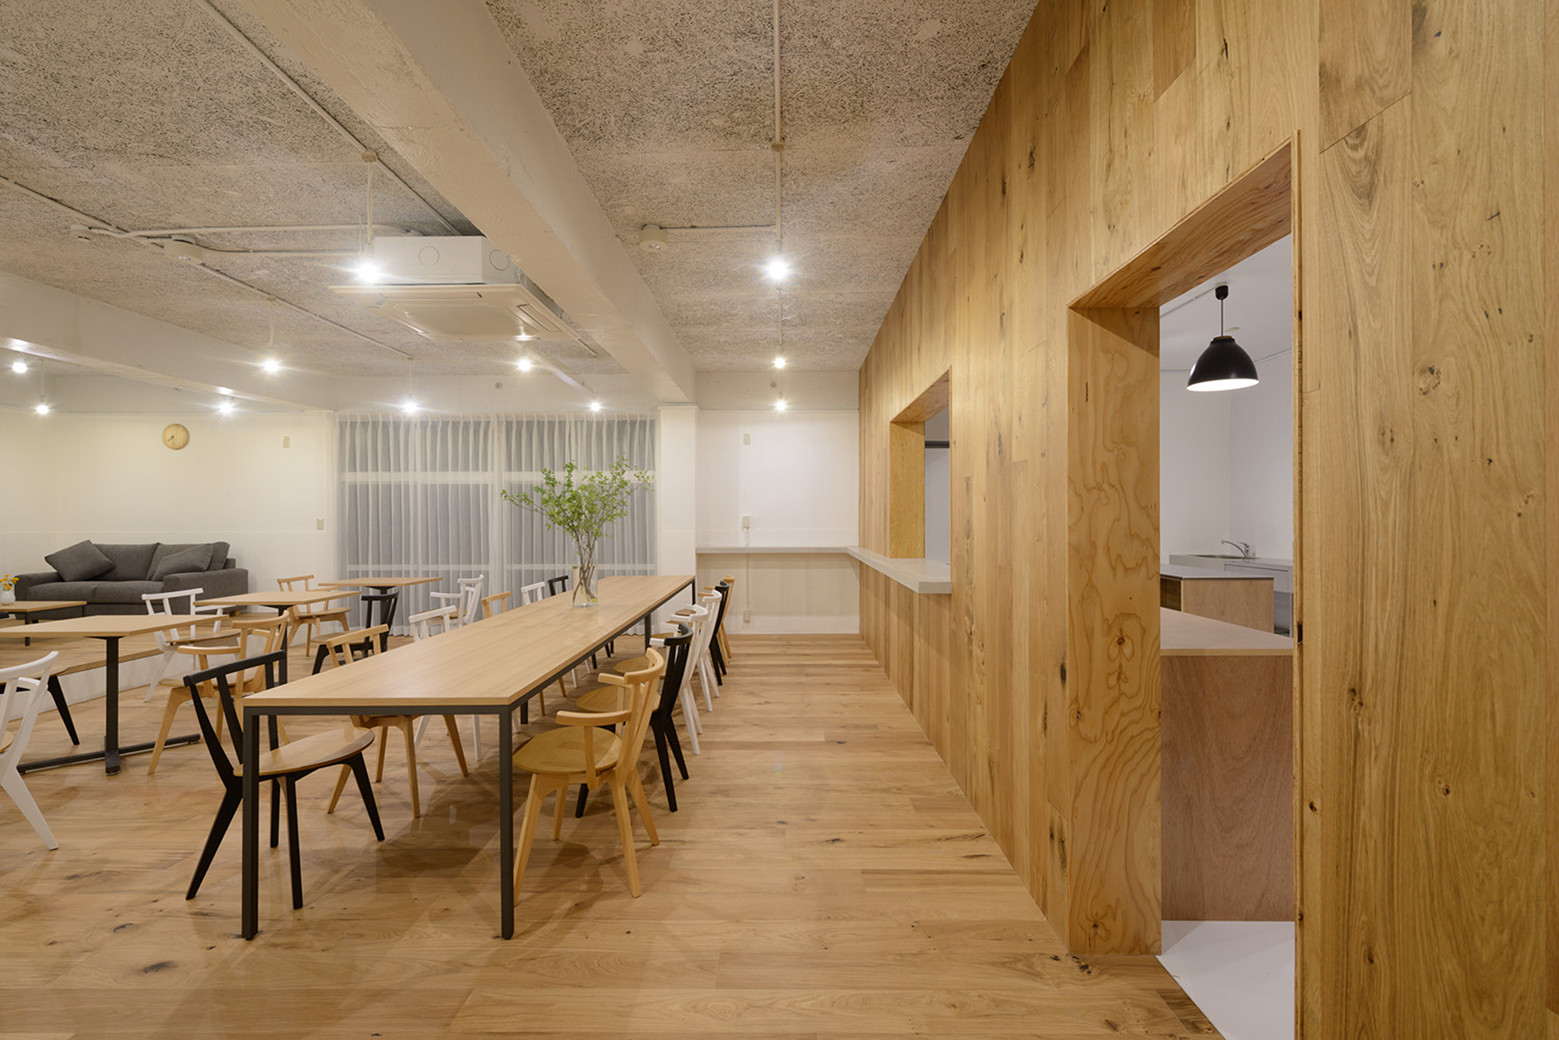 Share House Funabashi Kasa Architects Archdaily